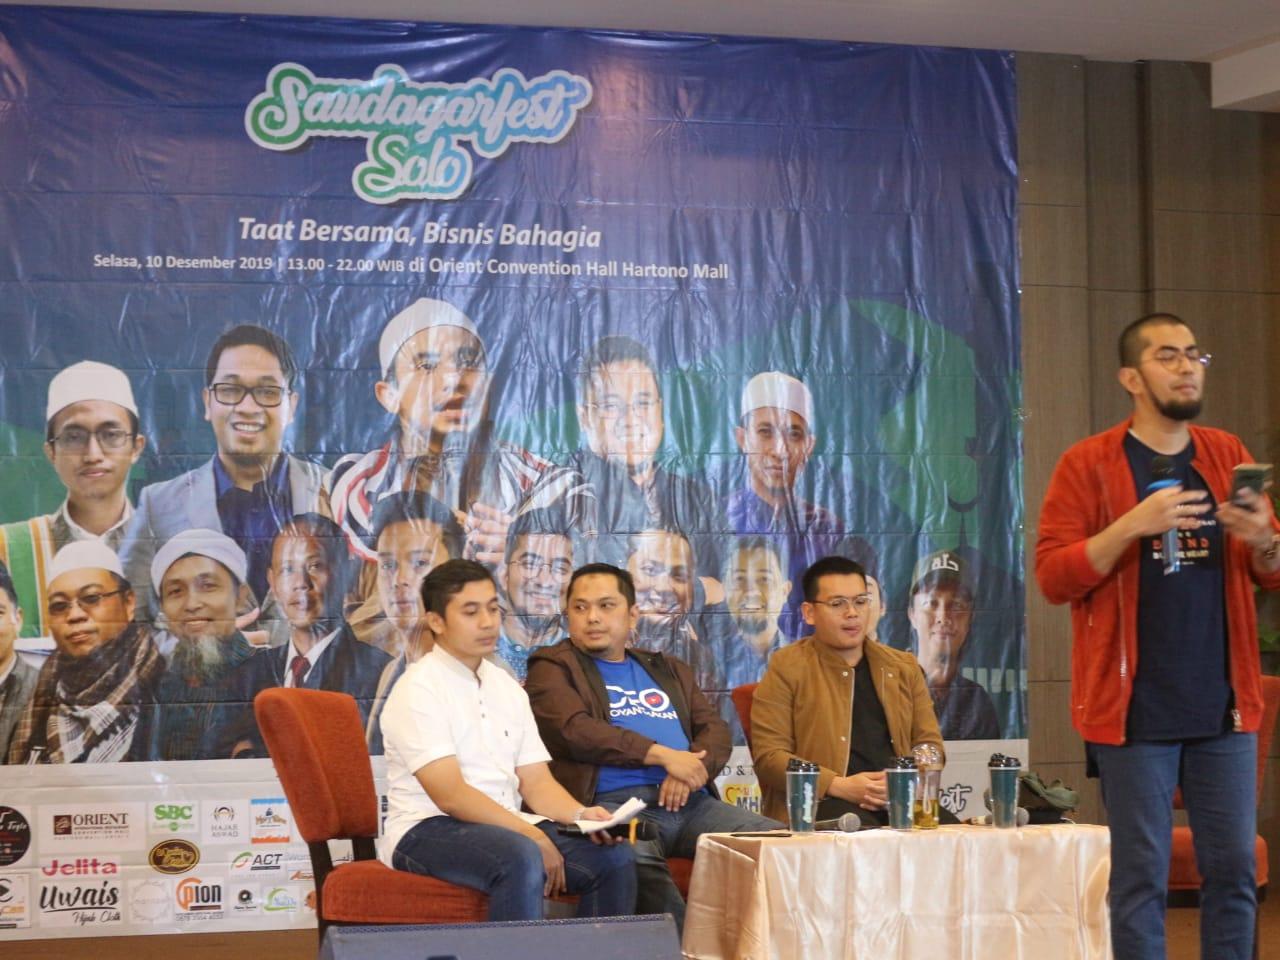 Saudagar Fest Solo Jadi Sarana Pengusaha Muslim Bersatu